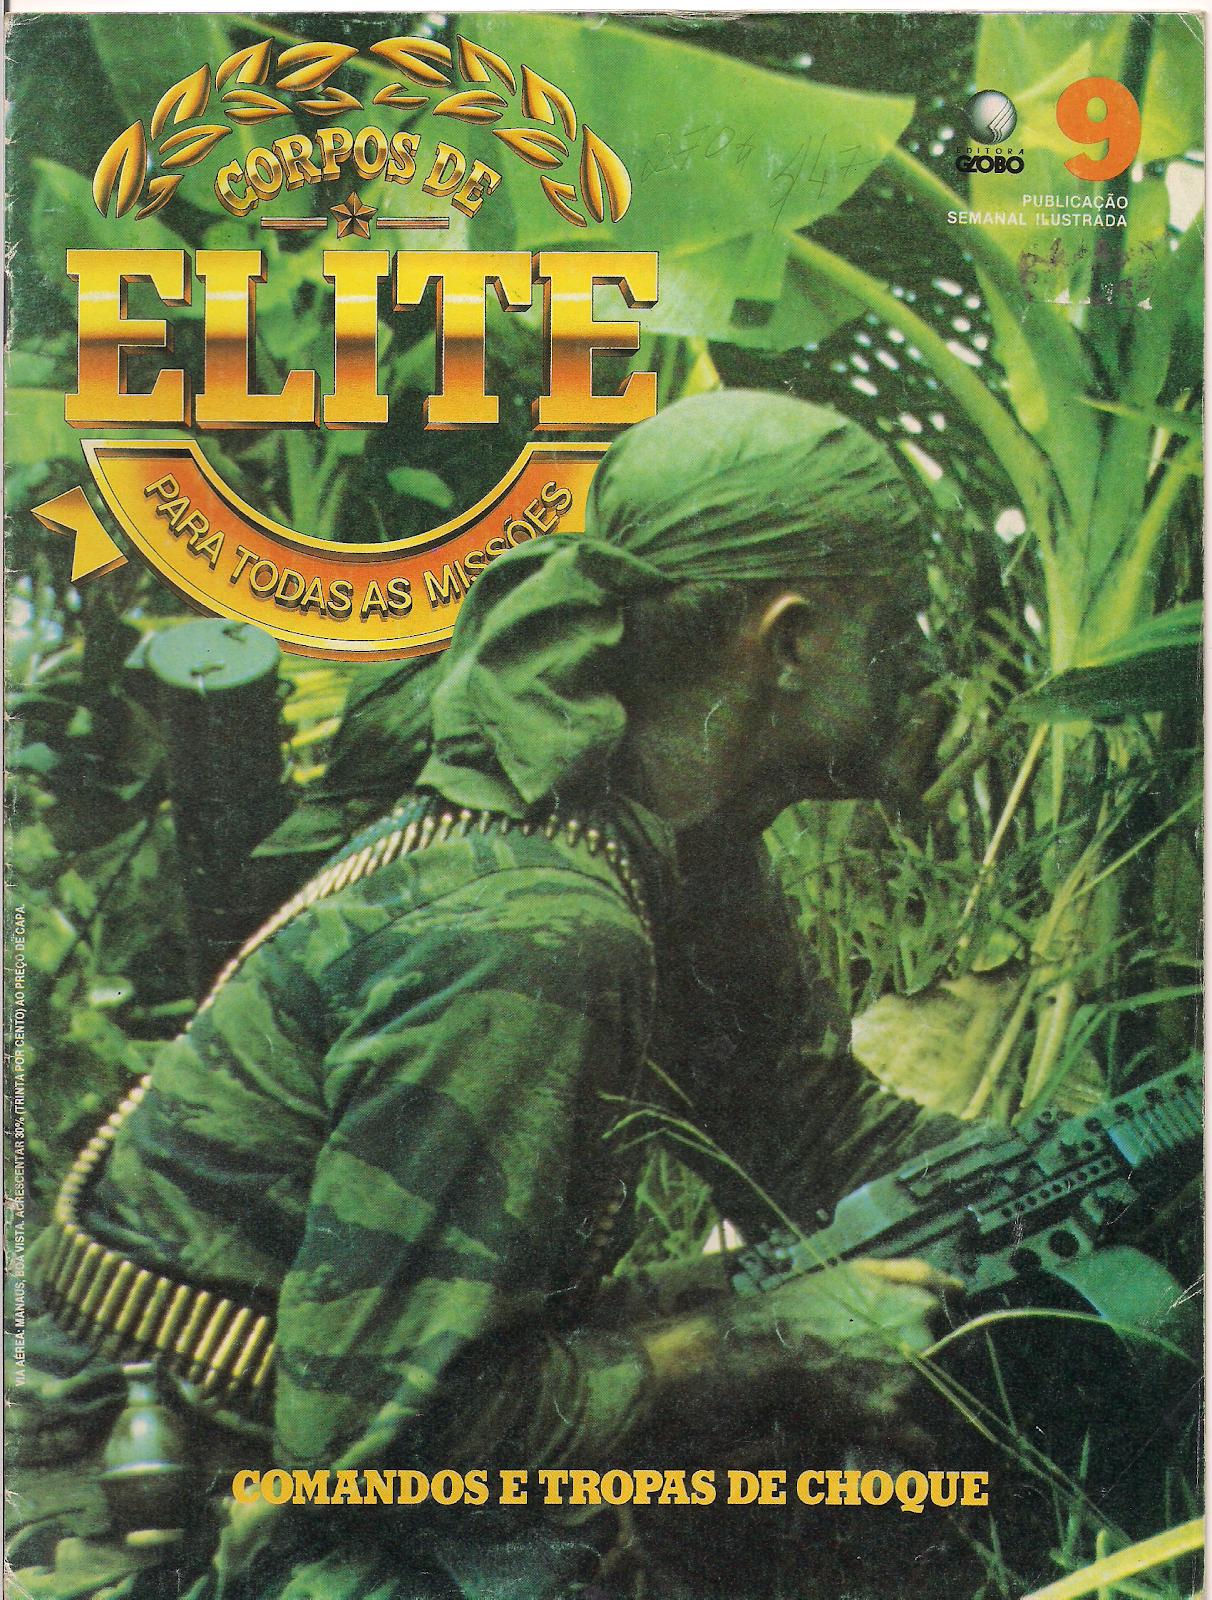 Corpos de Elite